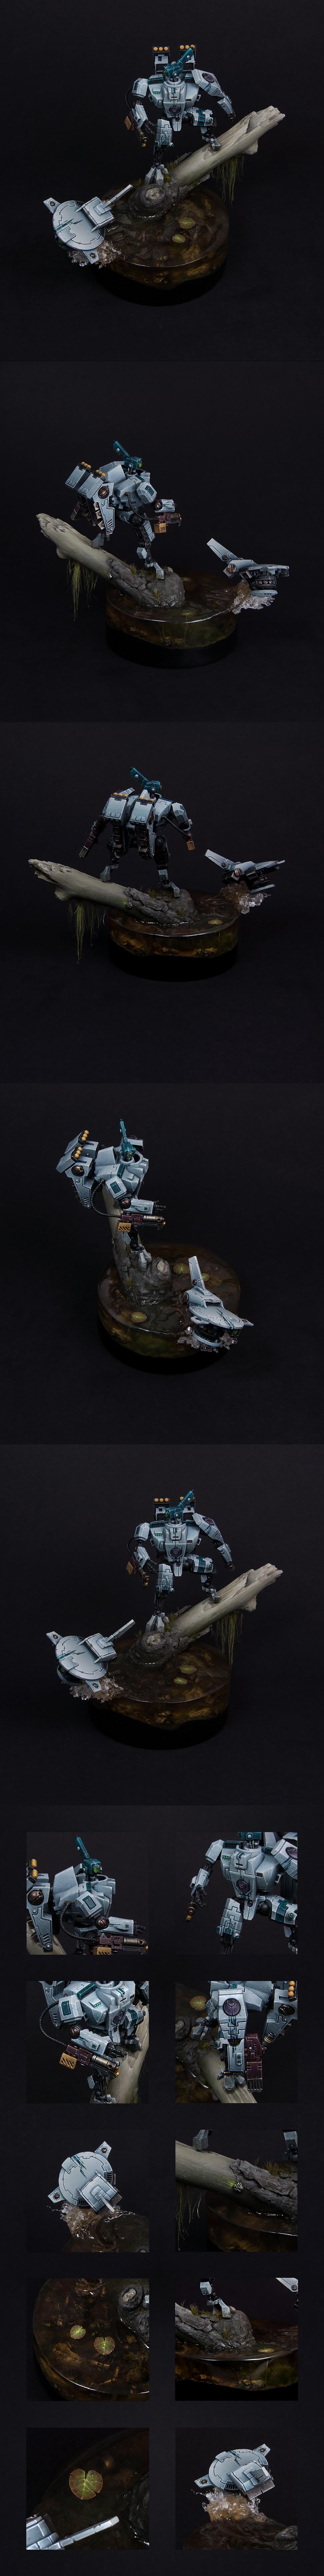 Tau XV8-11b Polypheme Crisis Battlesuit.